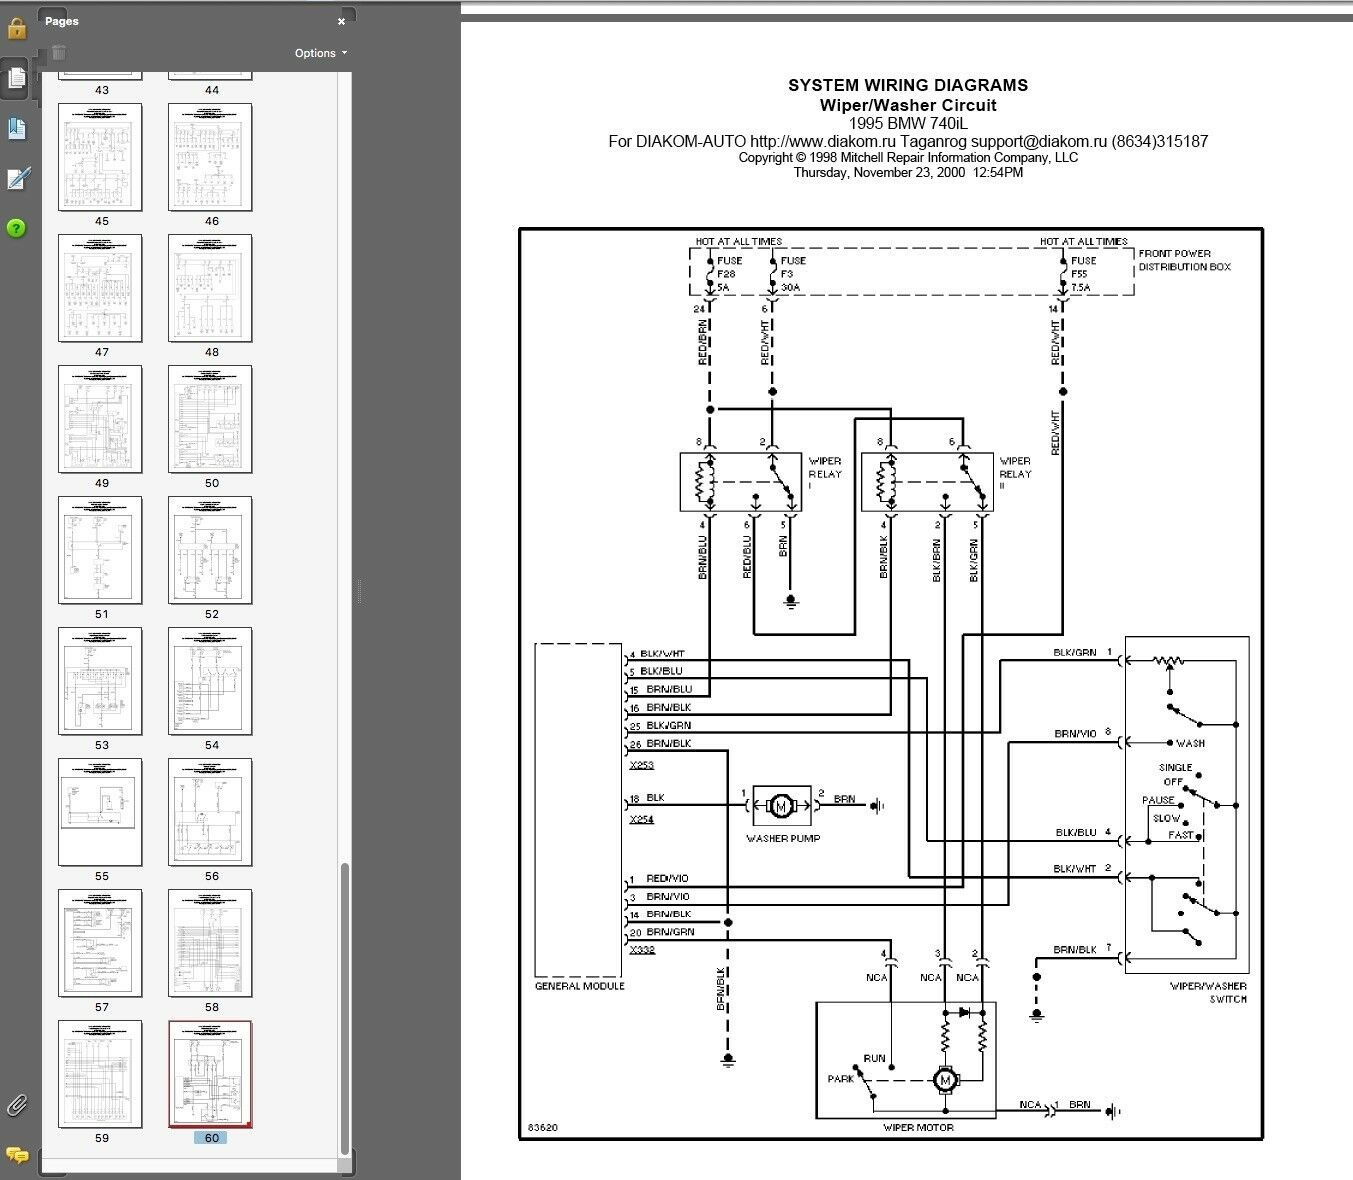 Schemi Elettrici Bmw : Bmw i e e t m electric troubleshooting manual schemi